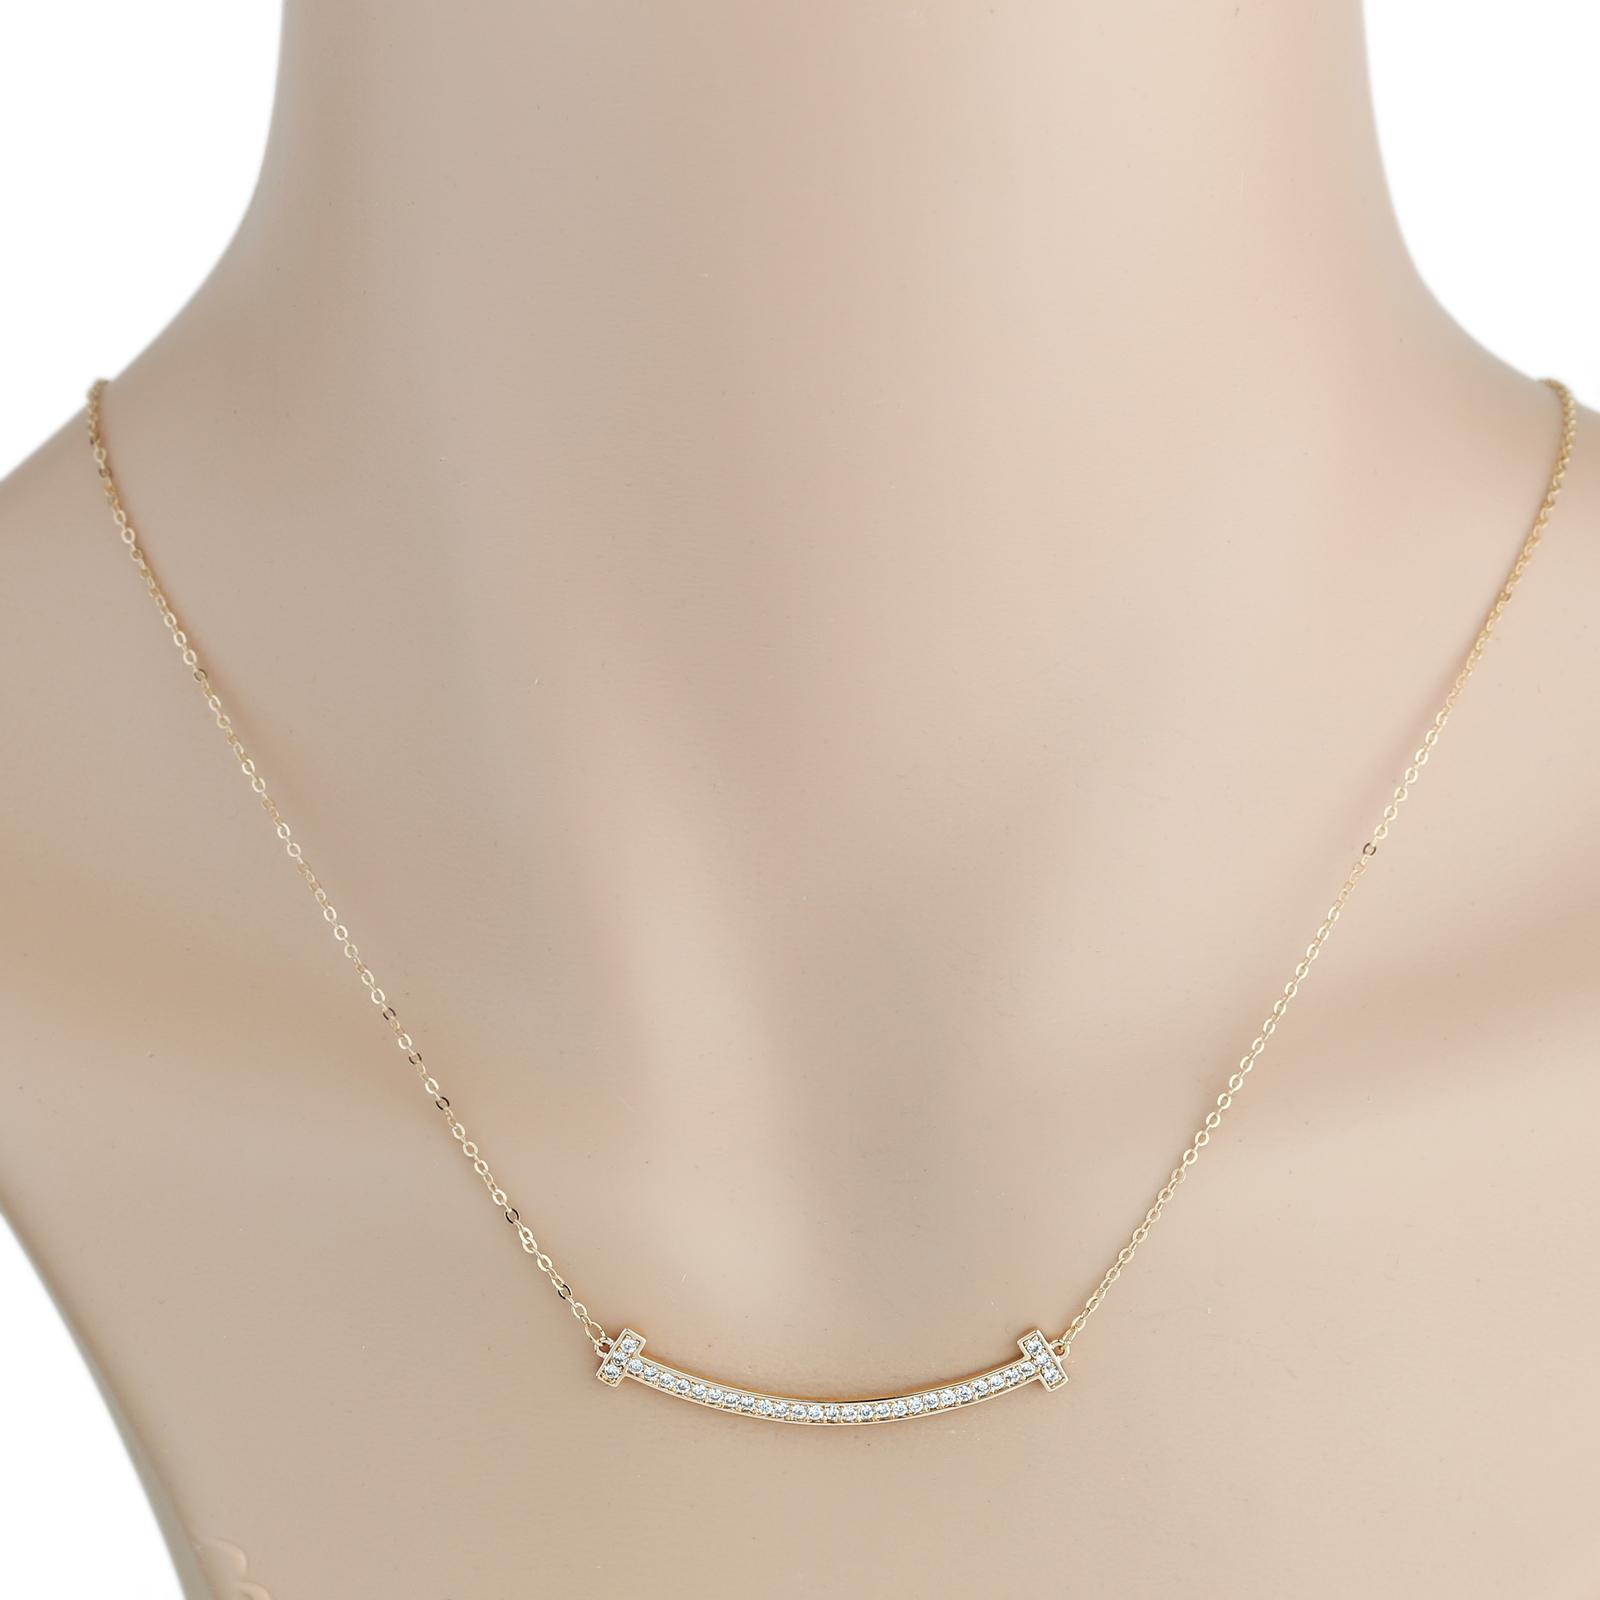 UE- Sleek Rose Tone Designer Bar Necklace With Pave Set Swarovski Style Crystals